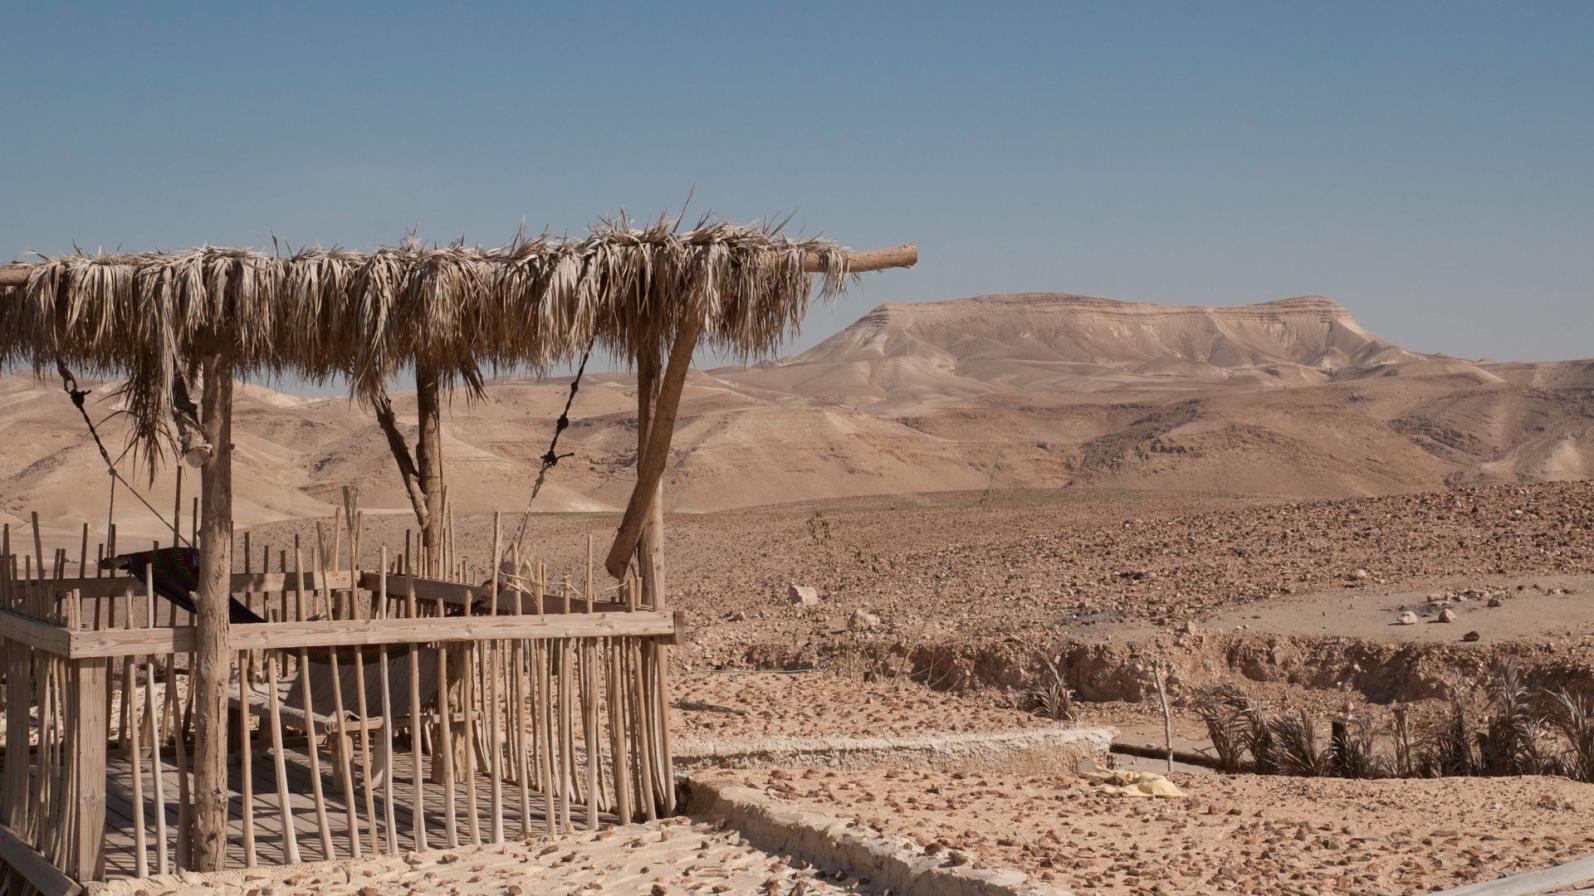 (View from Kfar Hanokdim. Photo by Joni Gritzner)